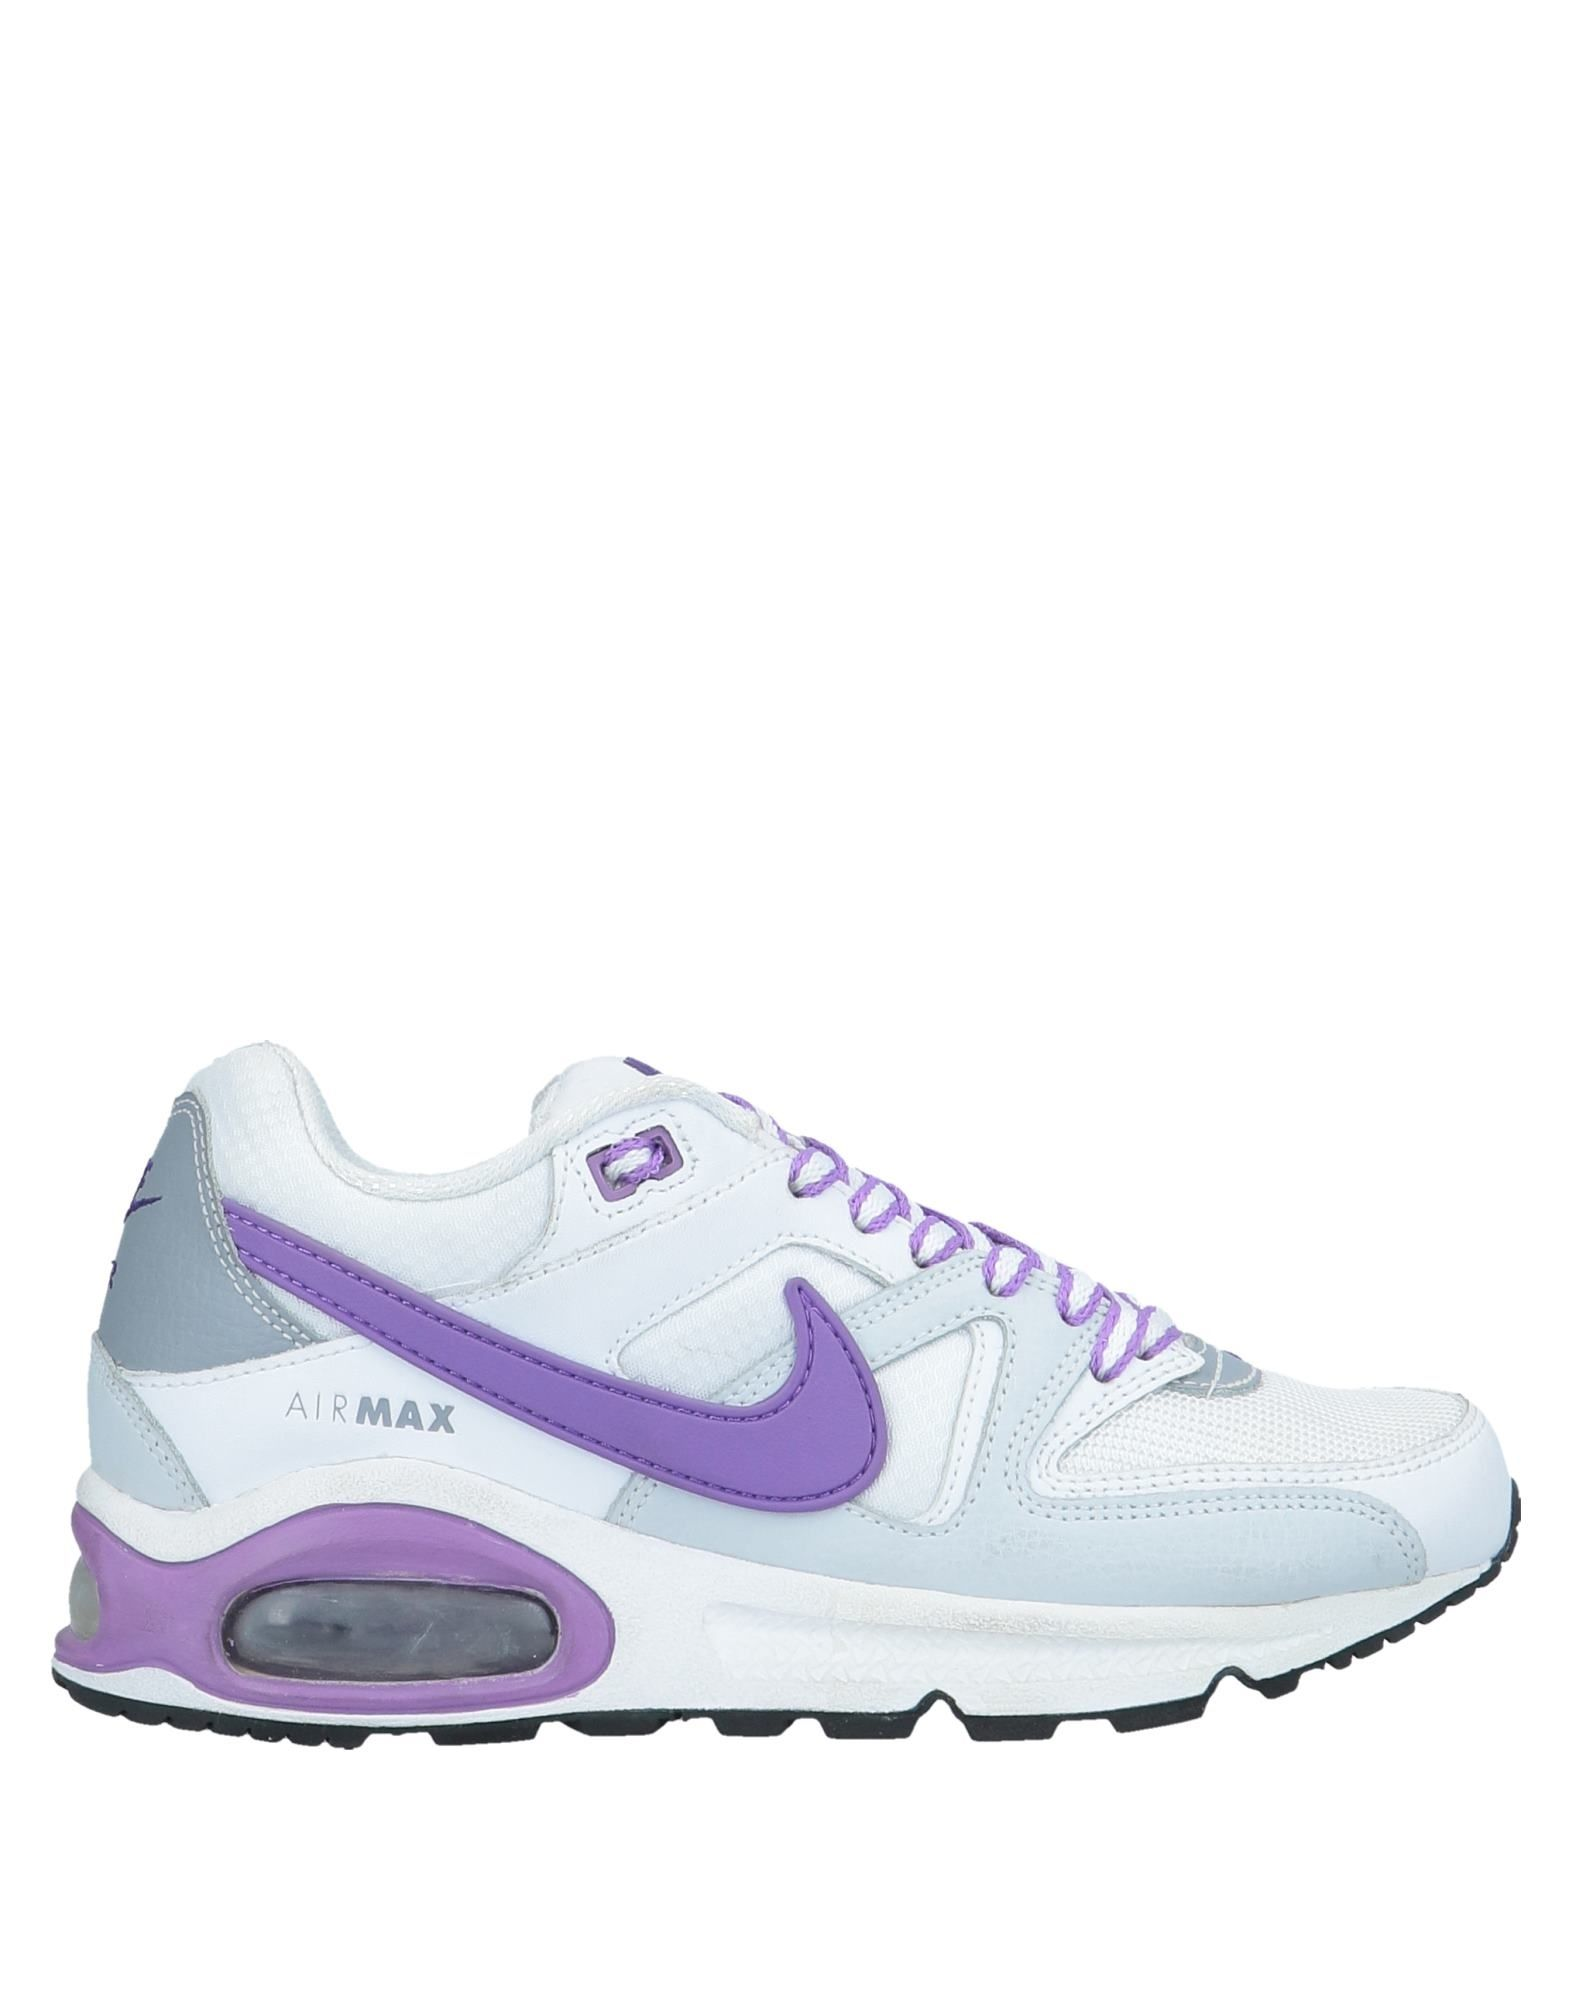 Nike on Sneakers - Women Nike Sneakers online on Nike  Australia - 11573528IO 7678a2